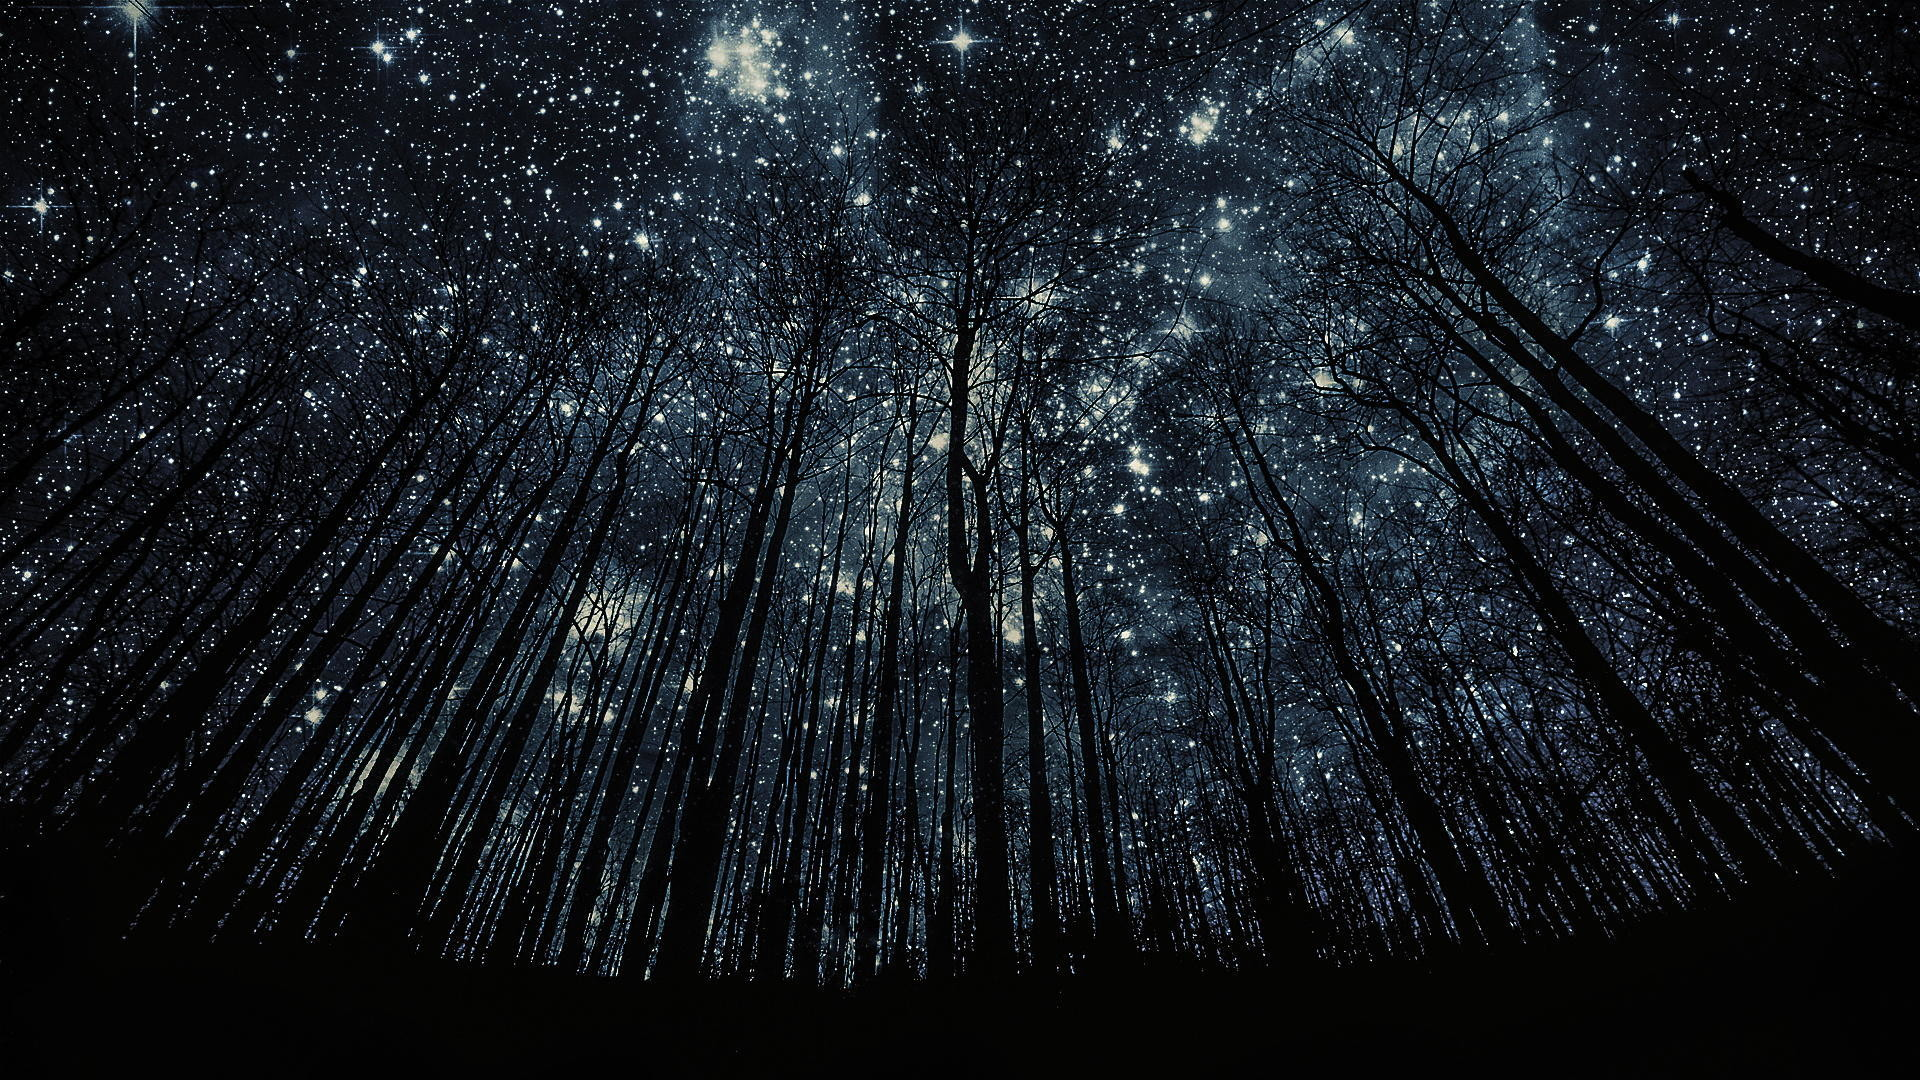 Night Sky Full HD Wallpapers High Resolution Wallpaper px 607.94  KB